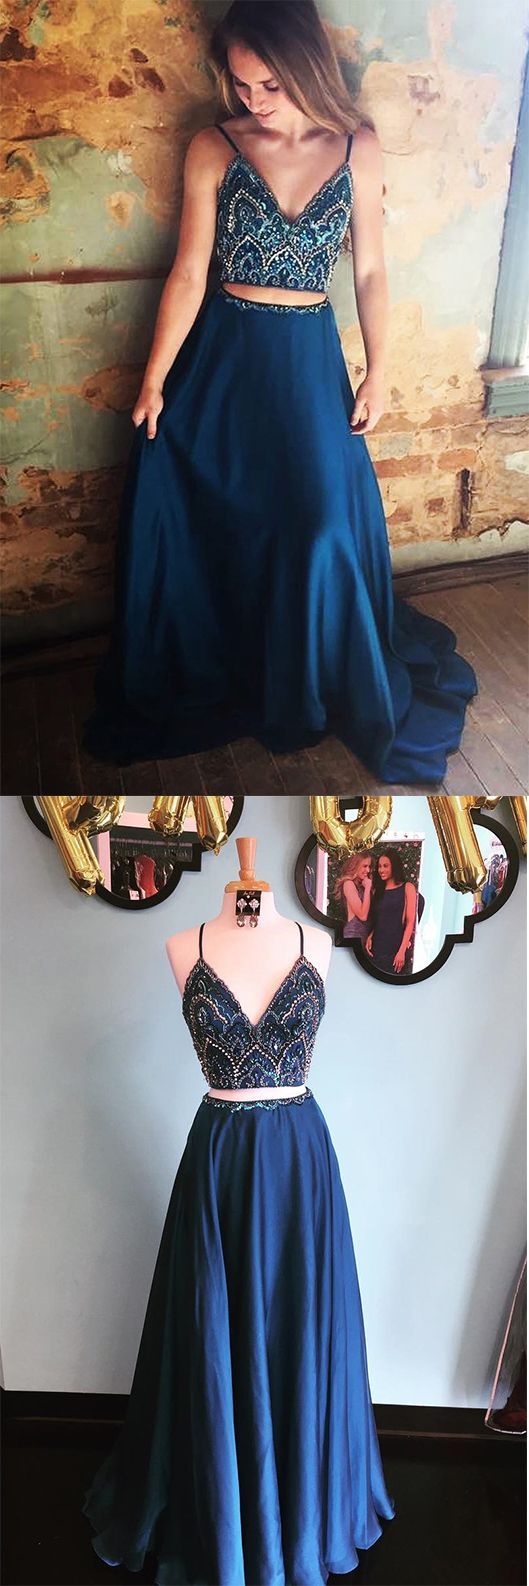 Sparkly prom dressestwo piece prom dressbeading prom dressesnavy